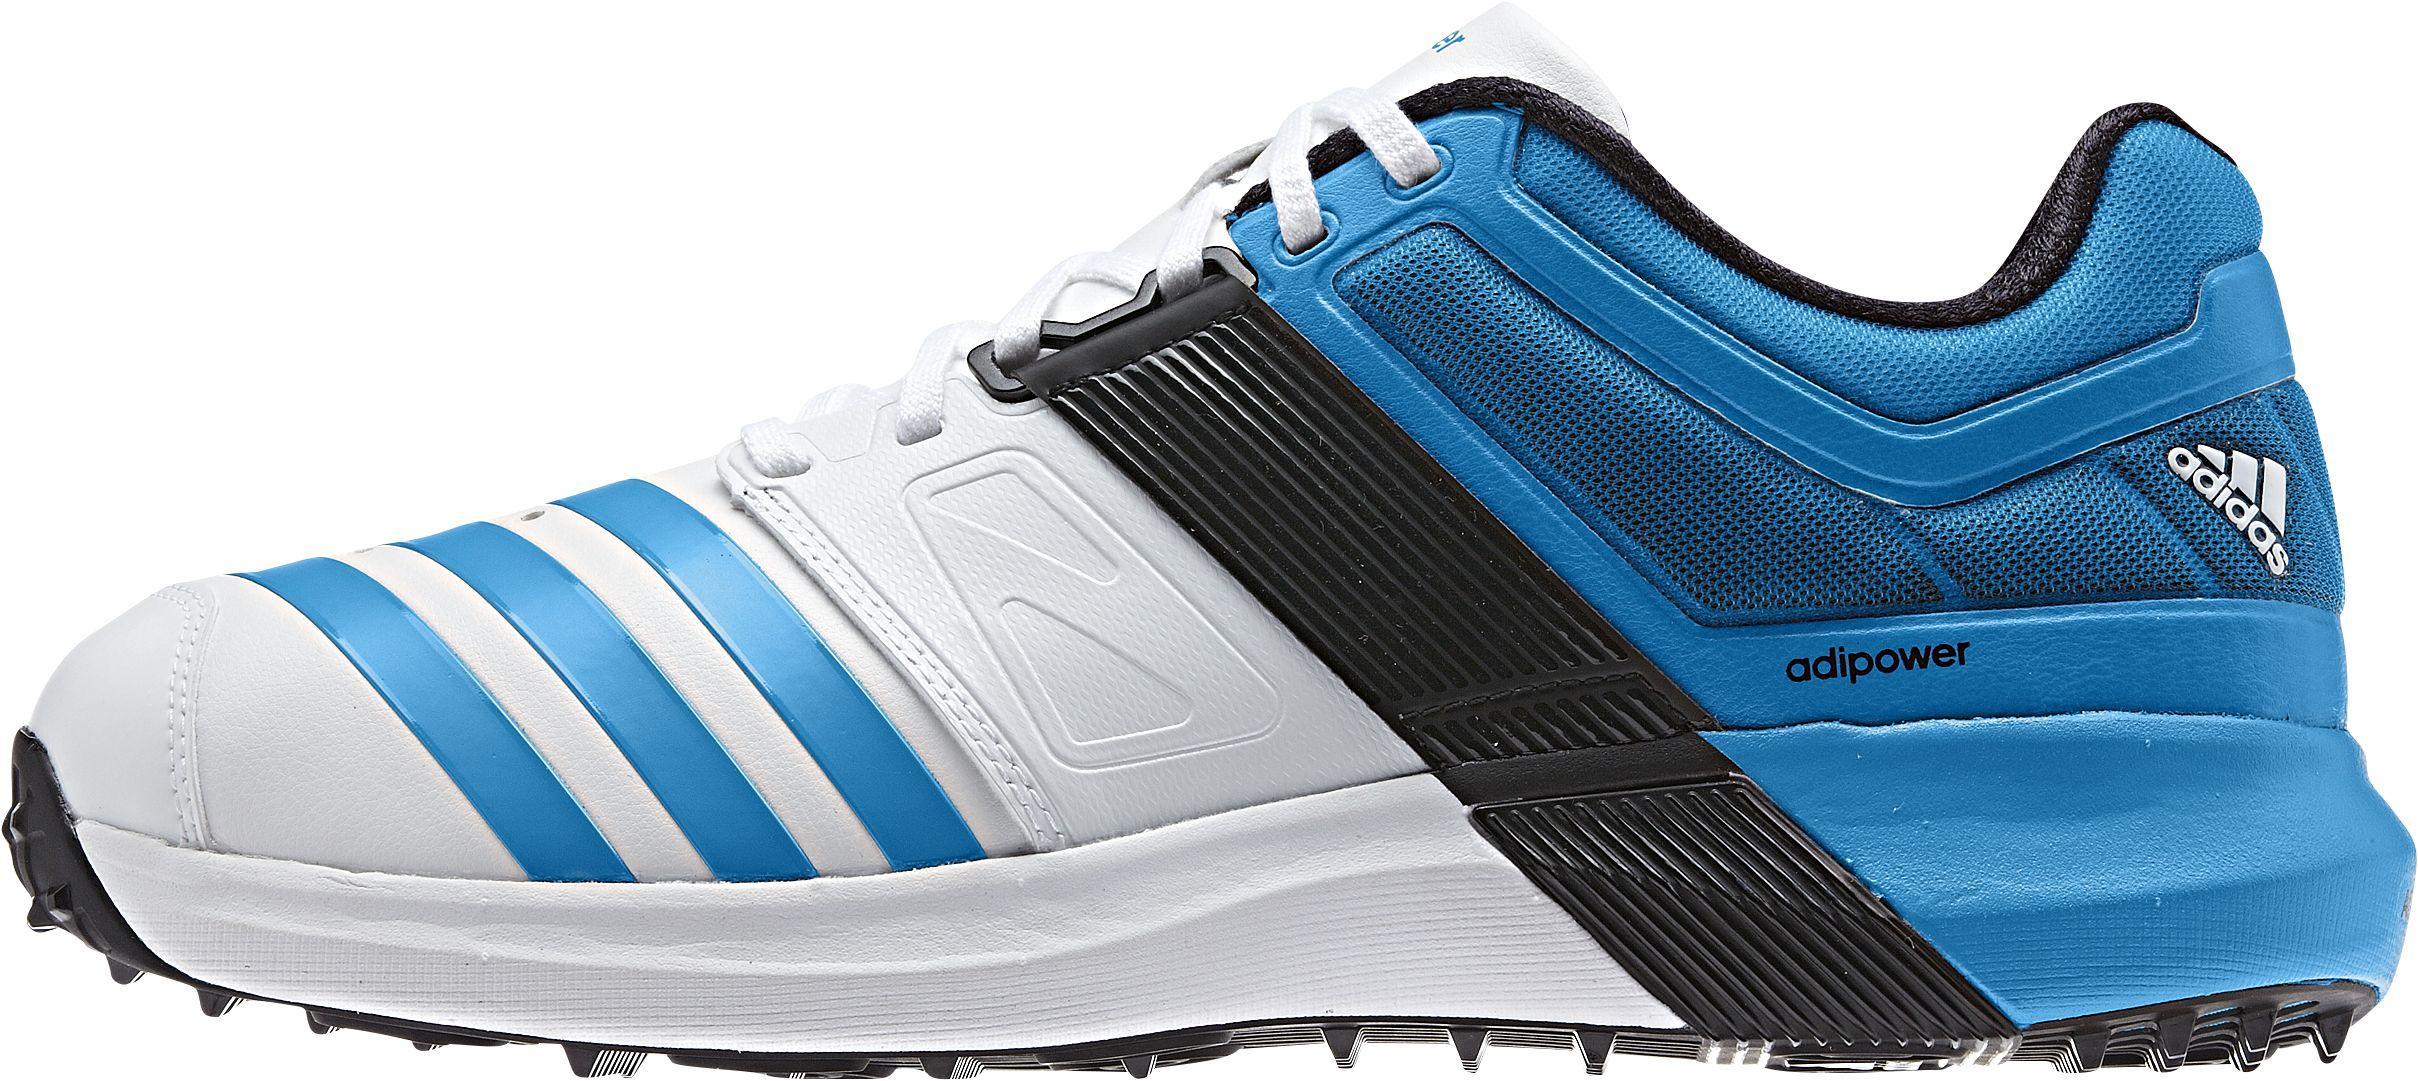 Adidas Adipower Vector